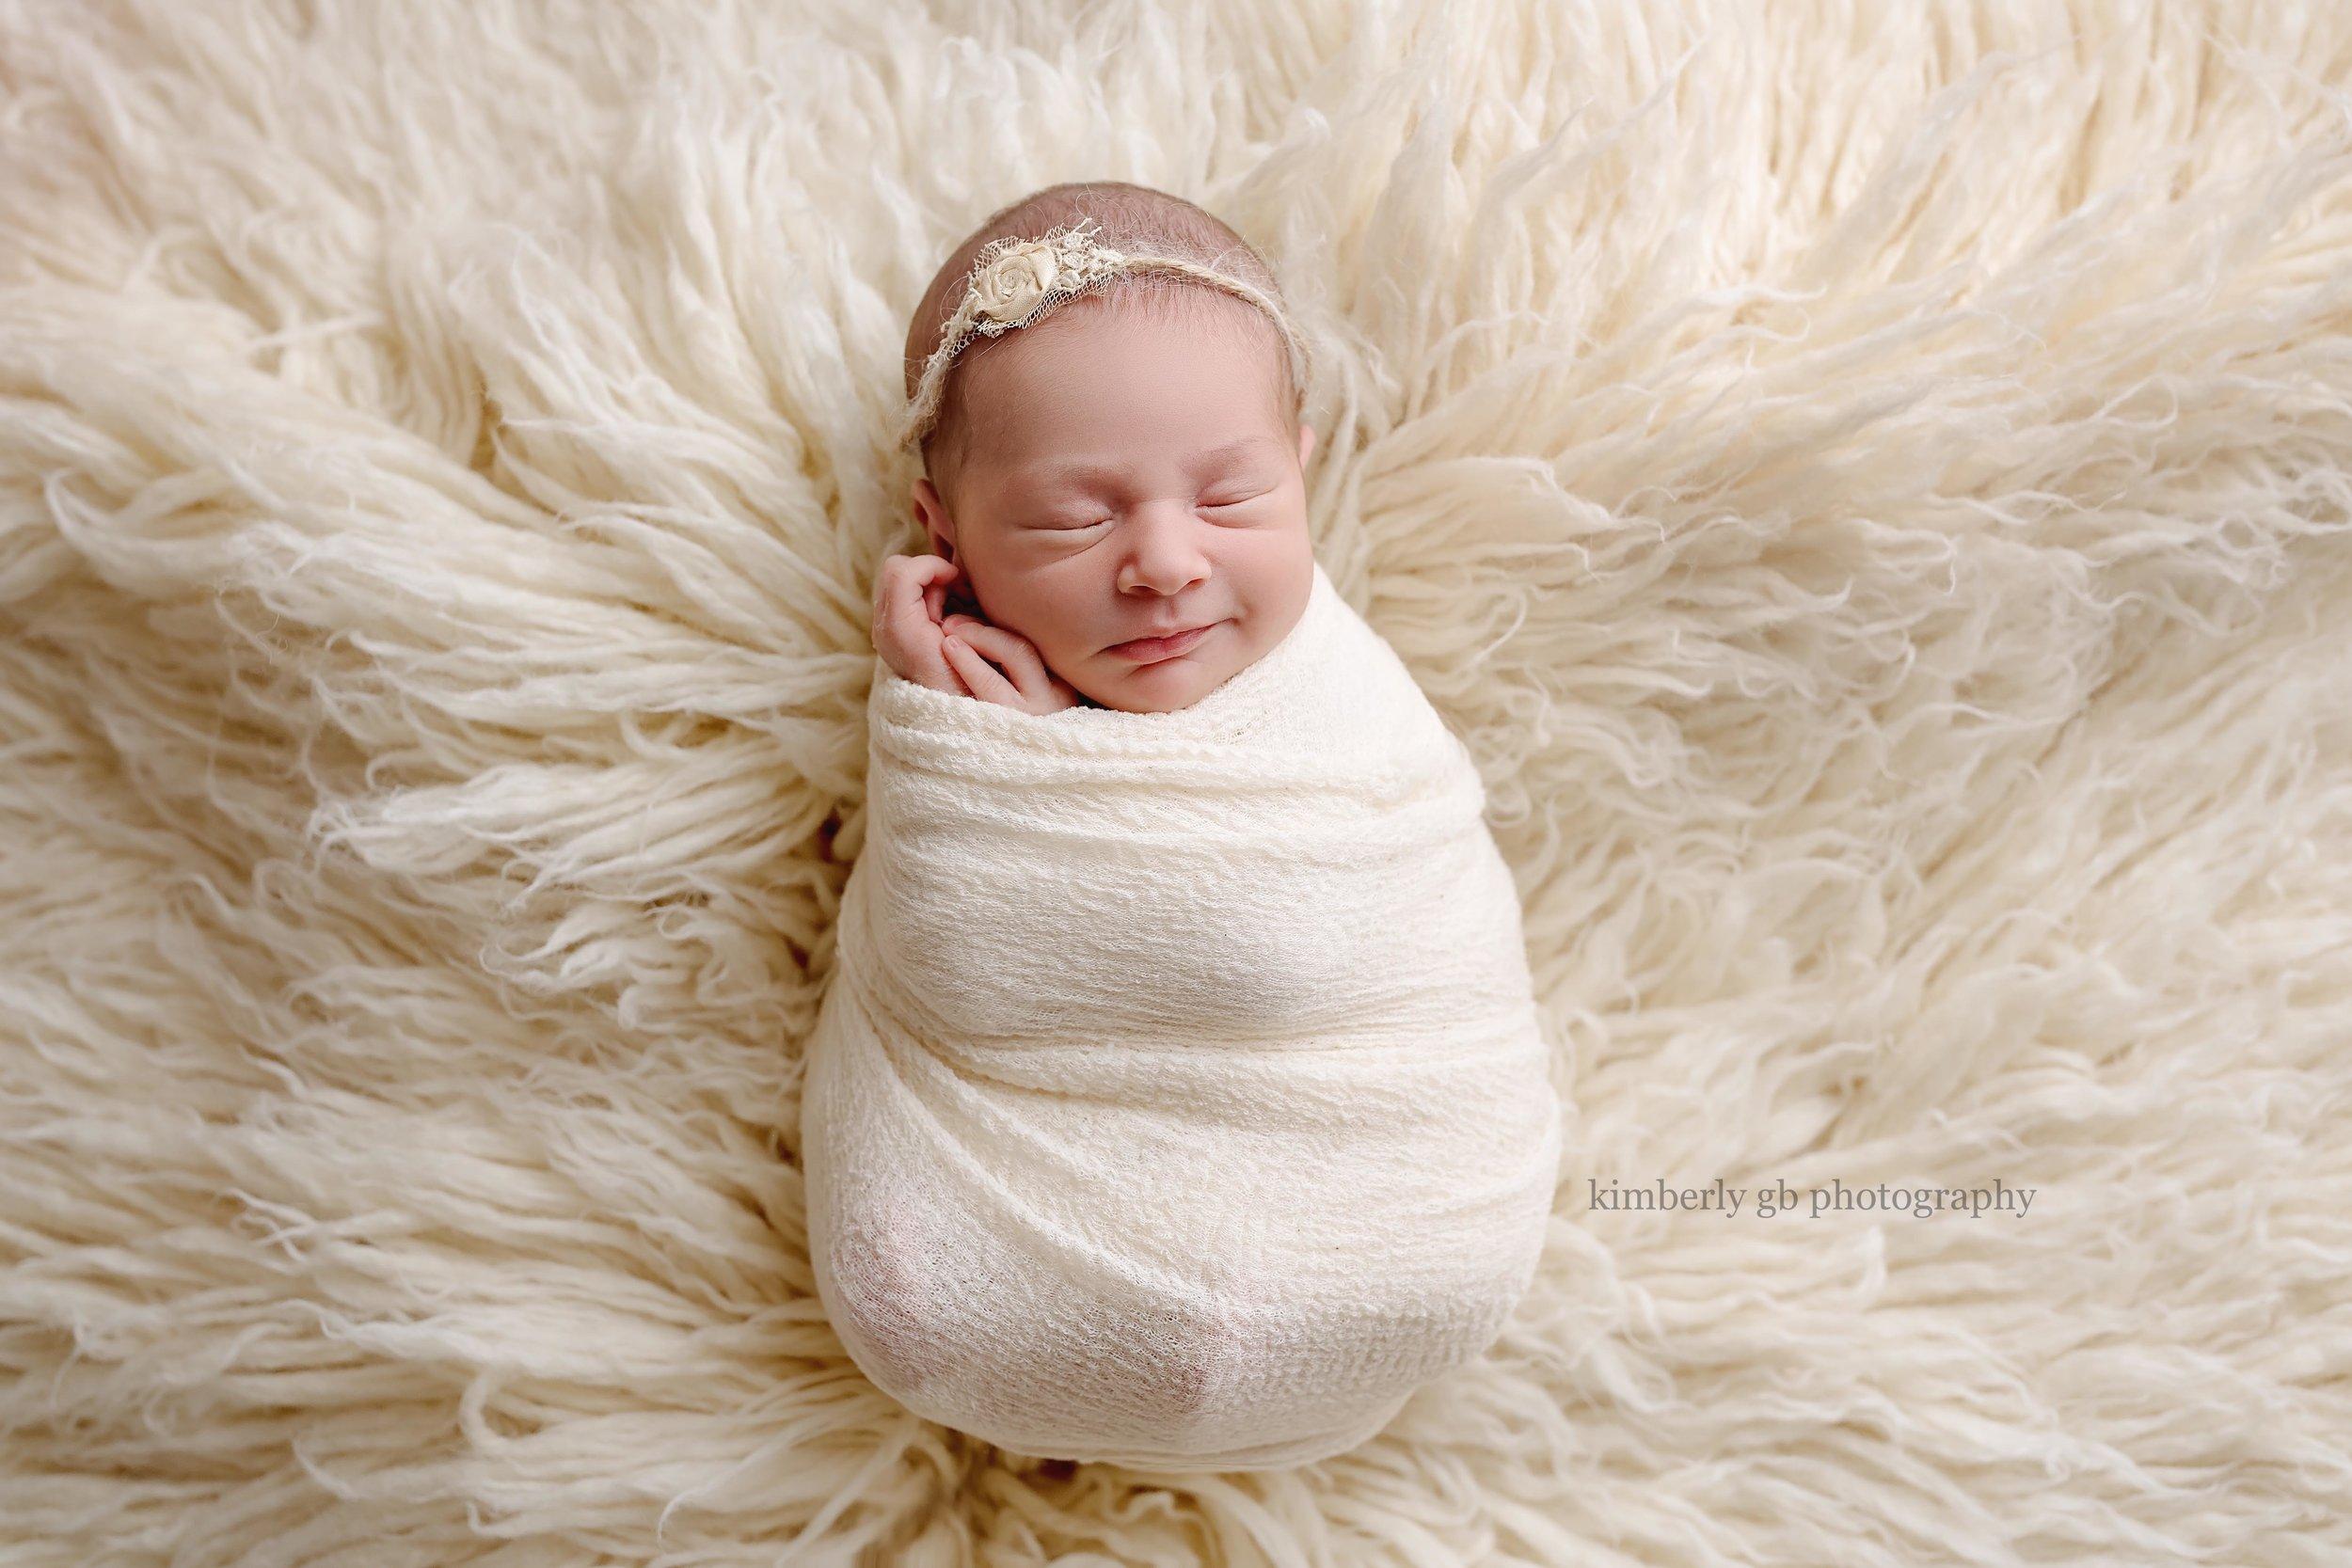 fotografia-de-recien-nacidos-bebes-newborn-en-puerto-rico-kimberly-gb-photography-fotografa-295.jpg